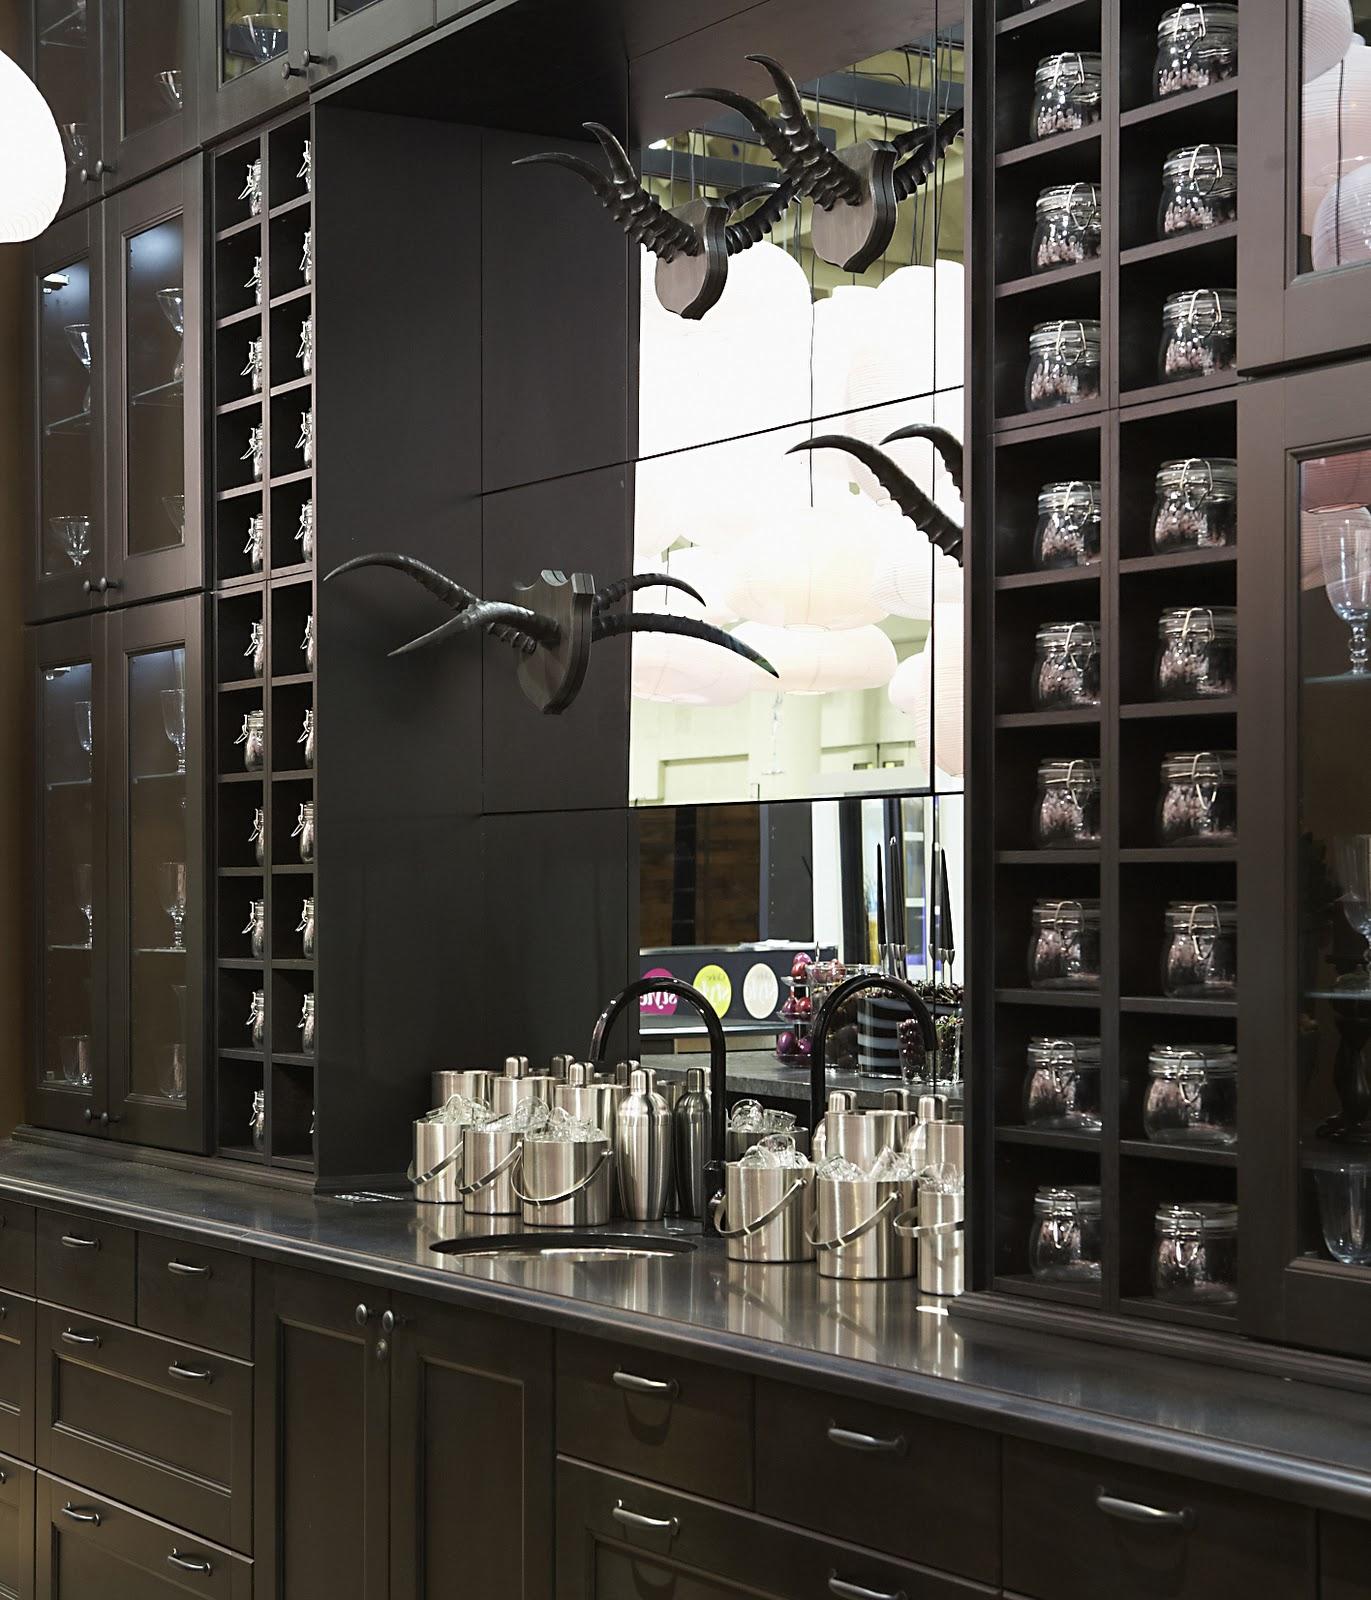 Ikea Kitchen Cabinetry: Holdem Celebrity: Ikea's Glamorous Black Country Kitchen